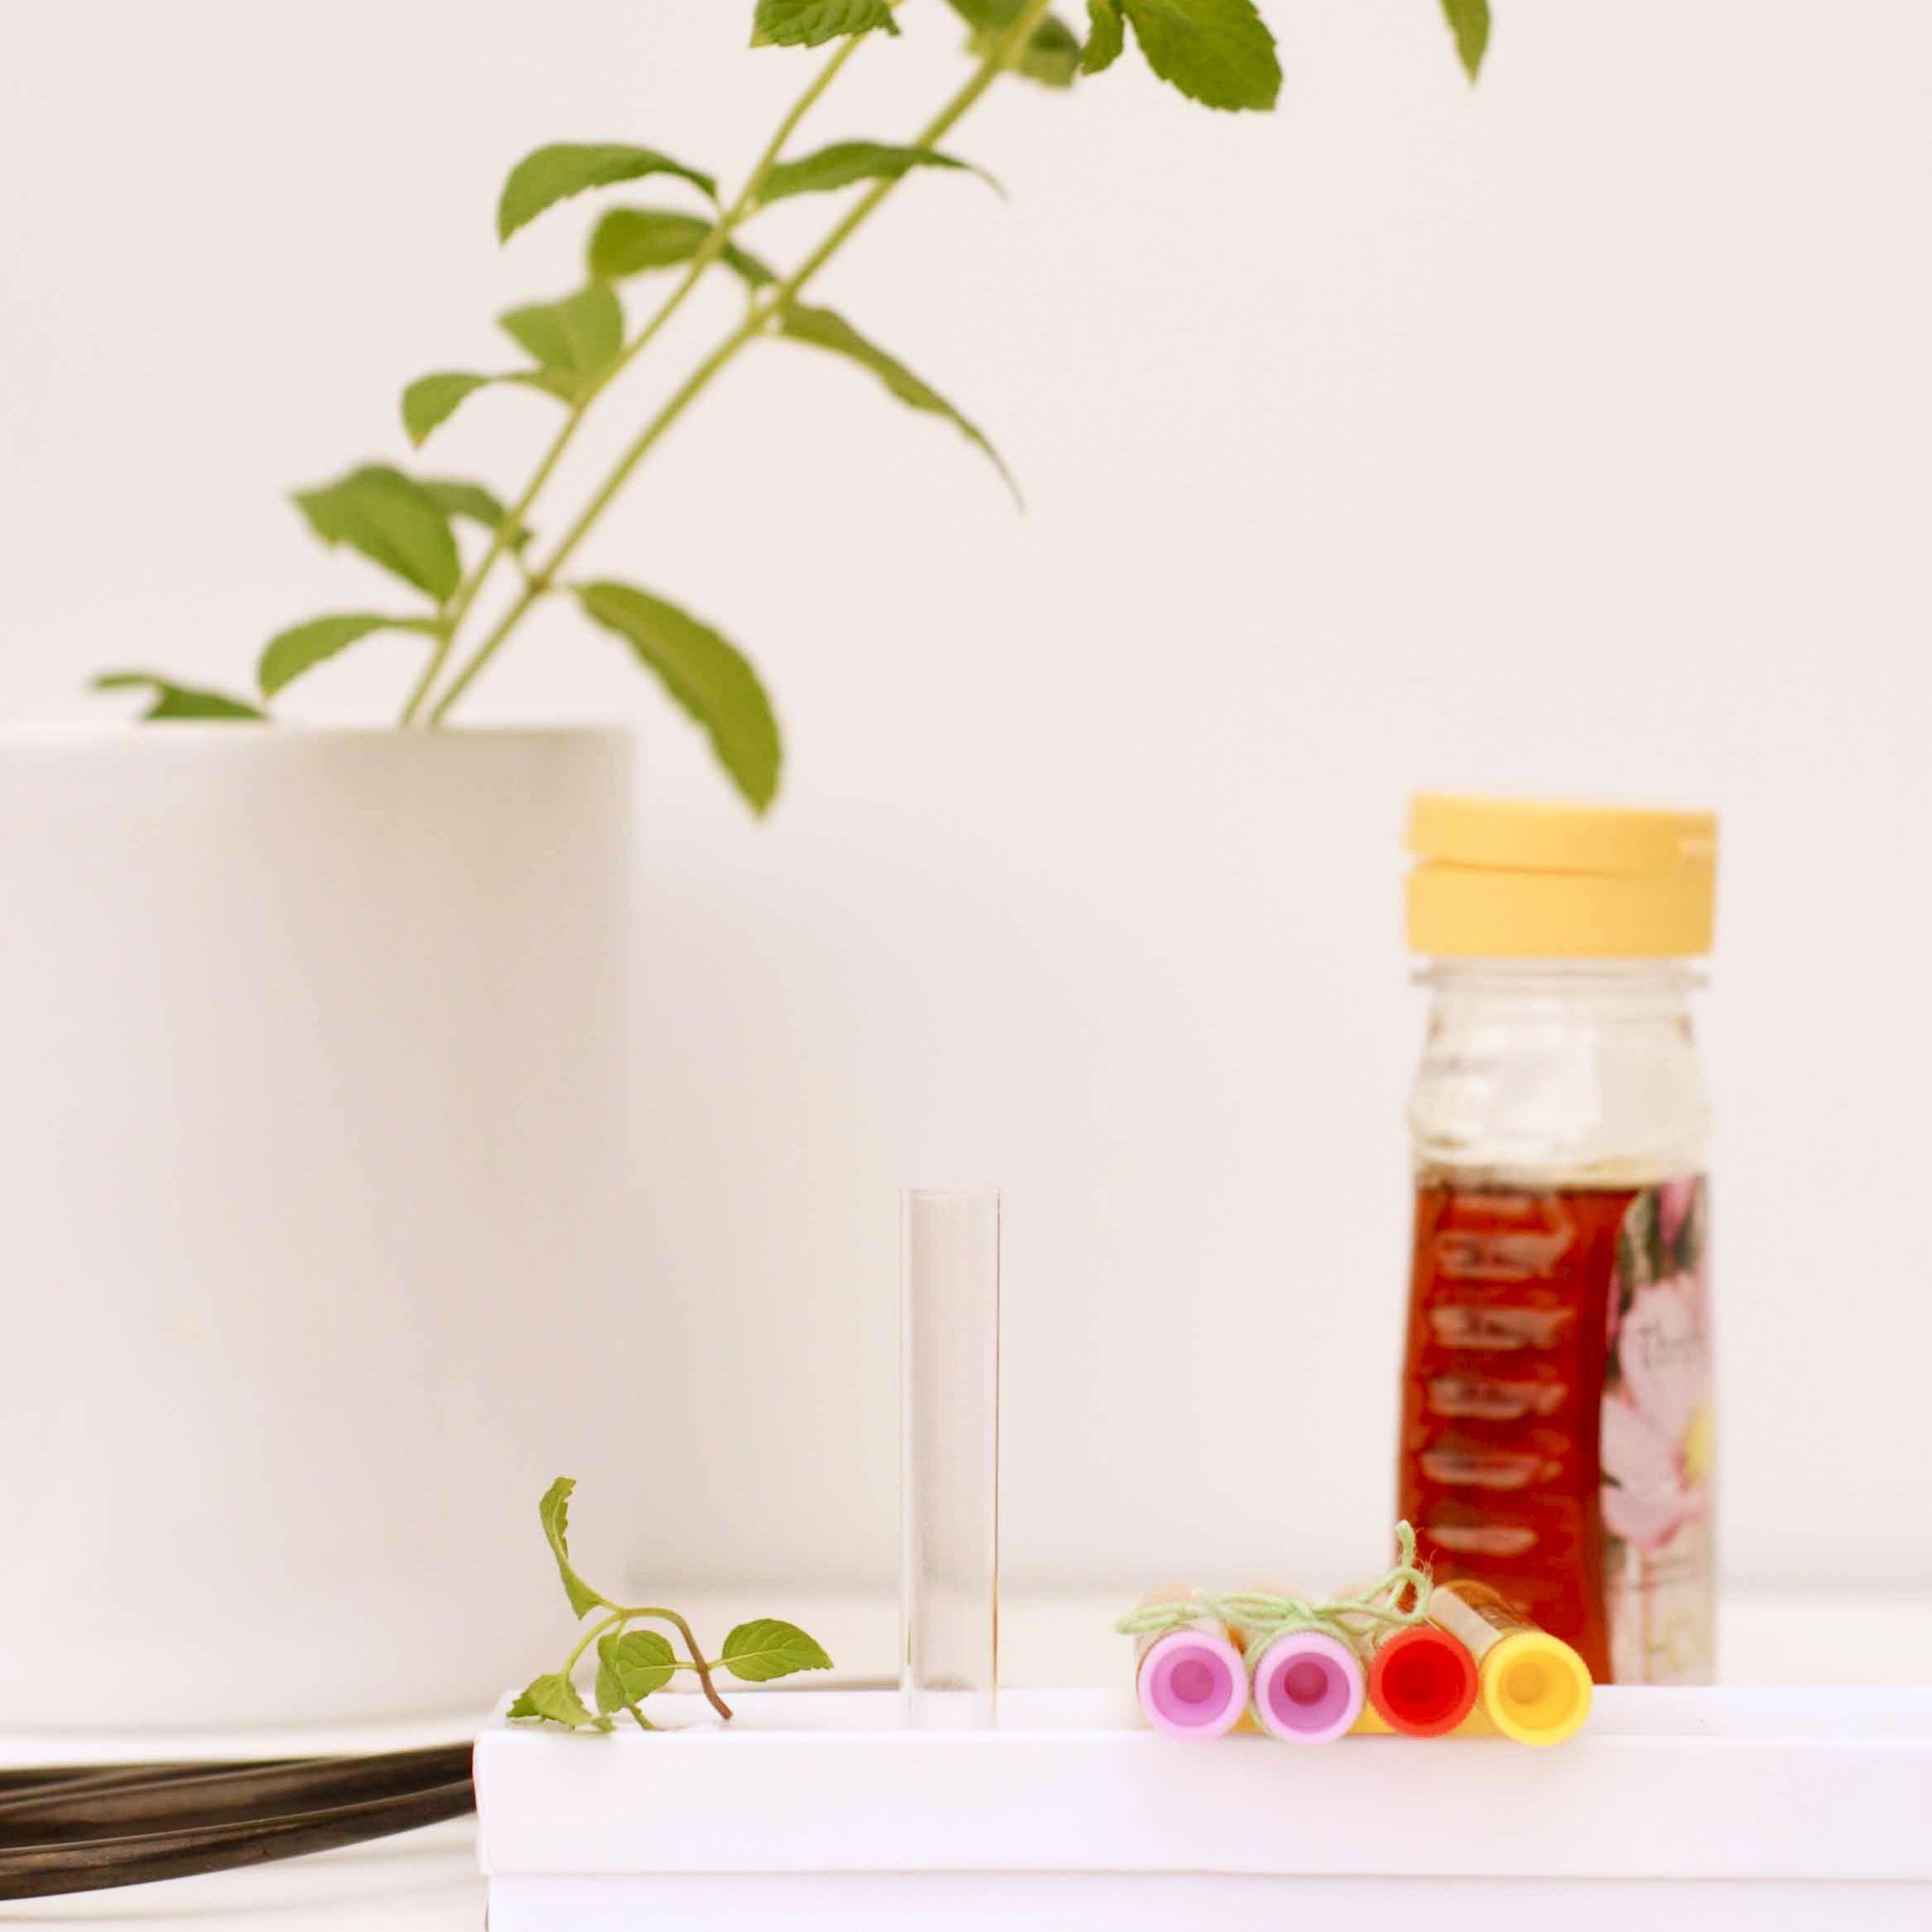 A Greenhouse Wedding | Honey favors, Honey and Favors